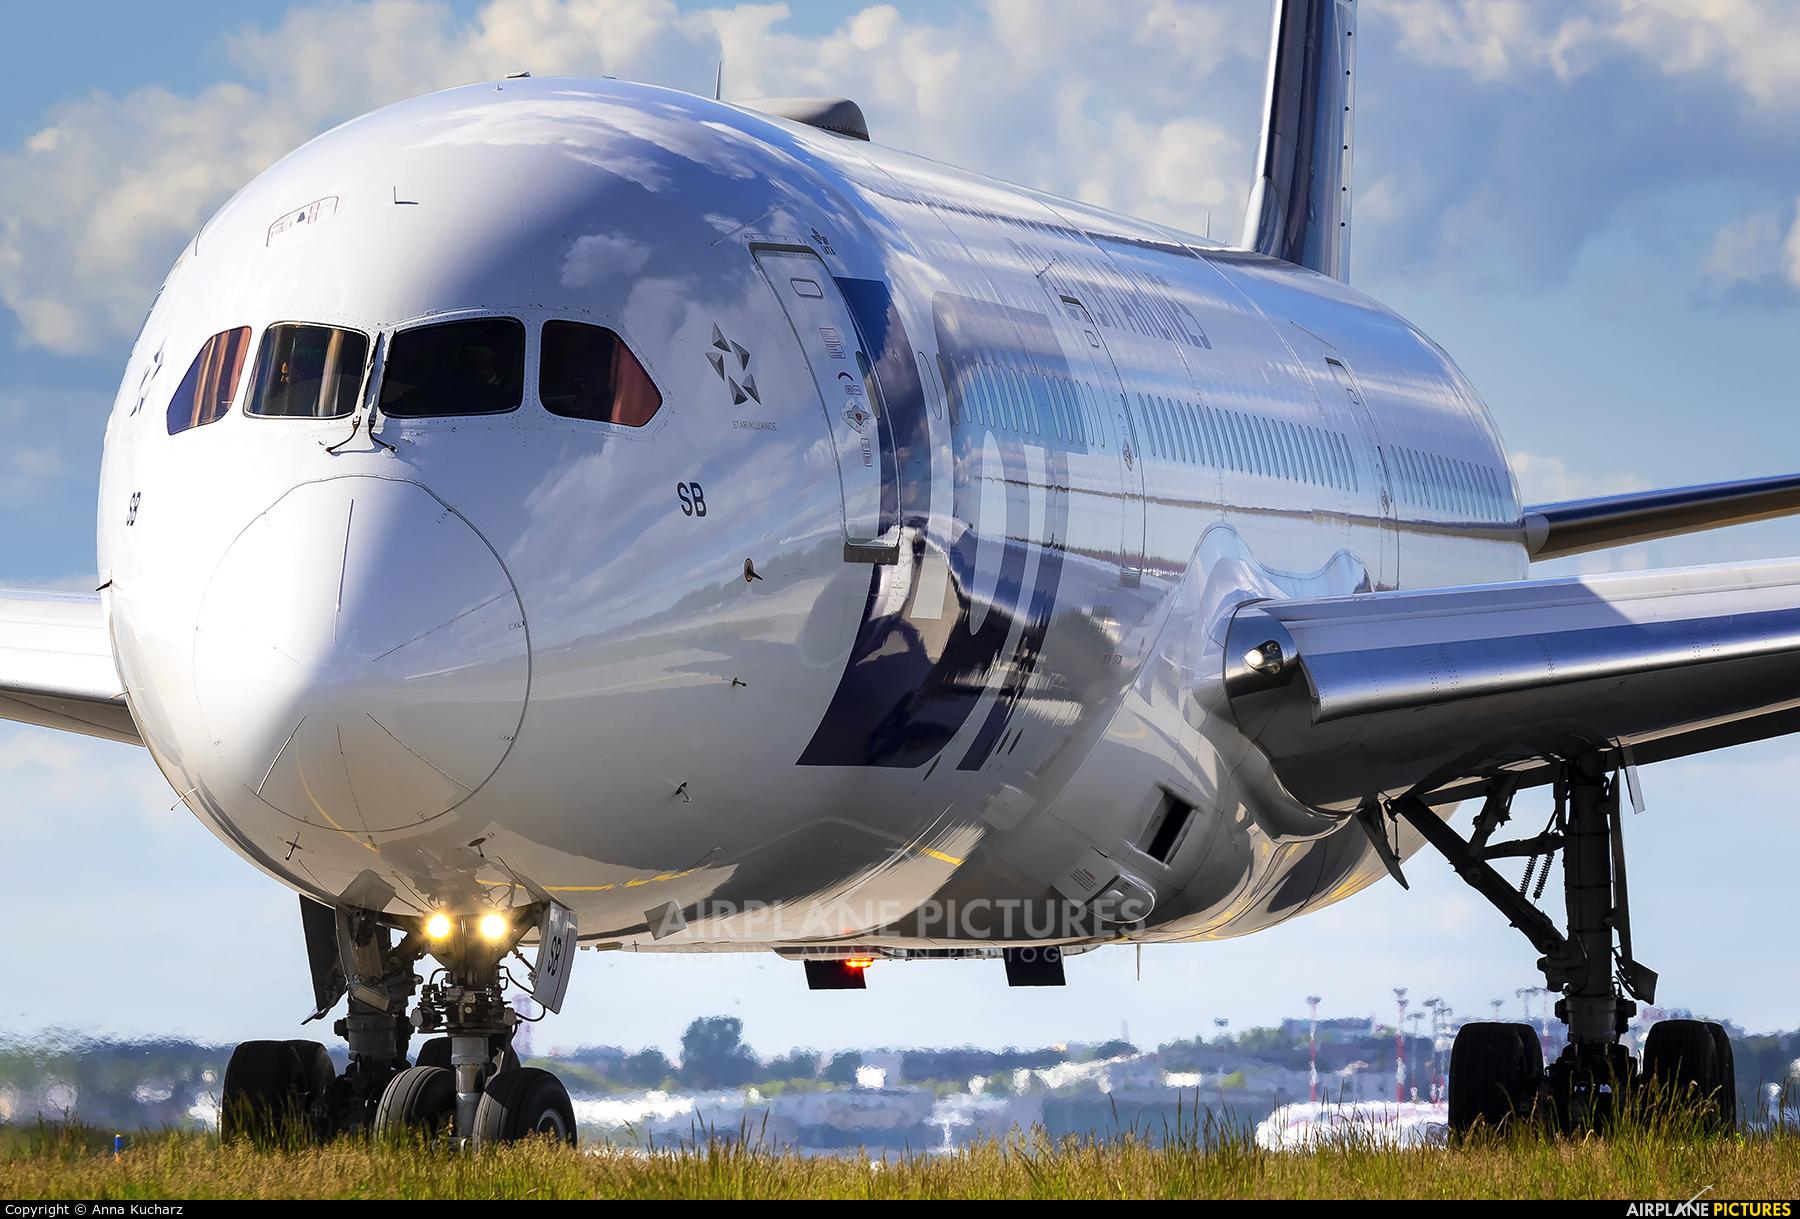 LOT - Polish Airlines SP-LSB aircraft at Warsaw - Frederic Chopin